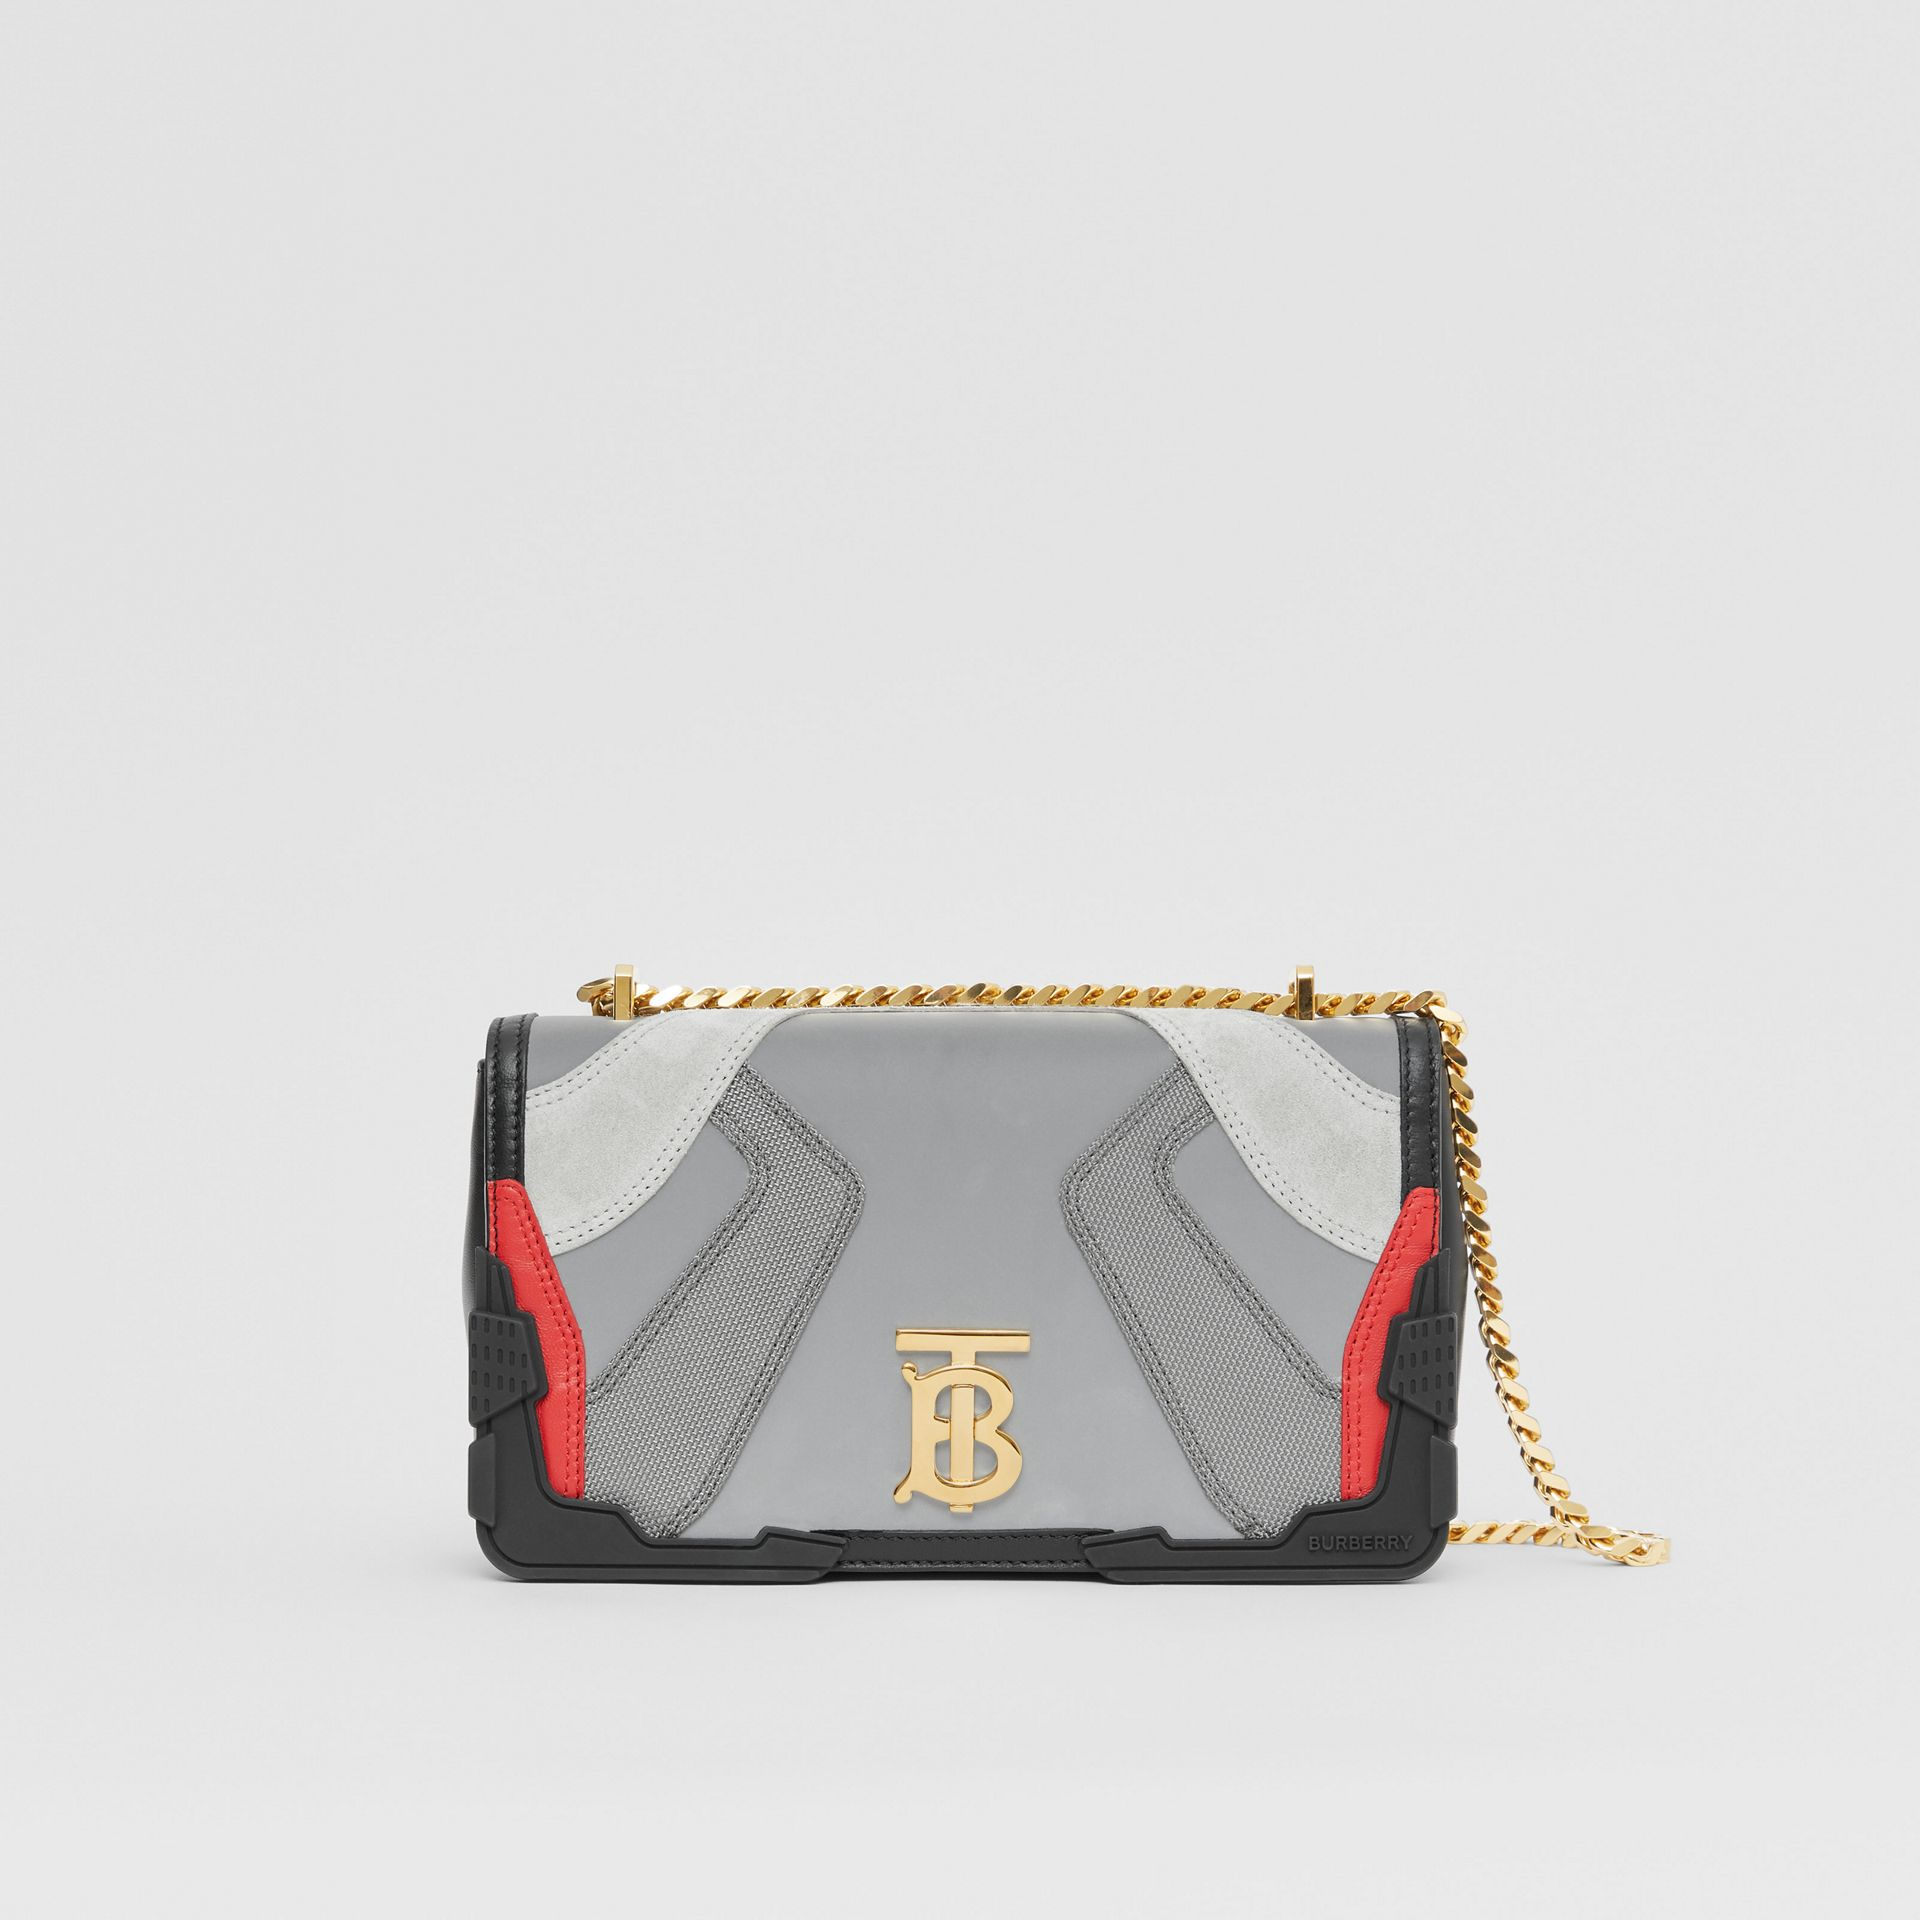 Small Appliqué Leather Lola Bag in Multicolour - Women | Burberry - gallery image 0